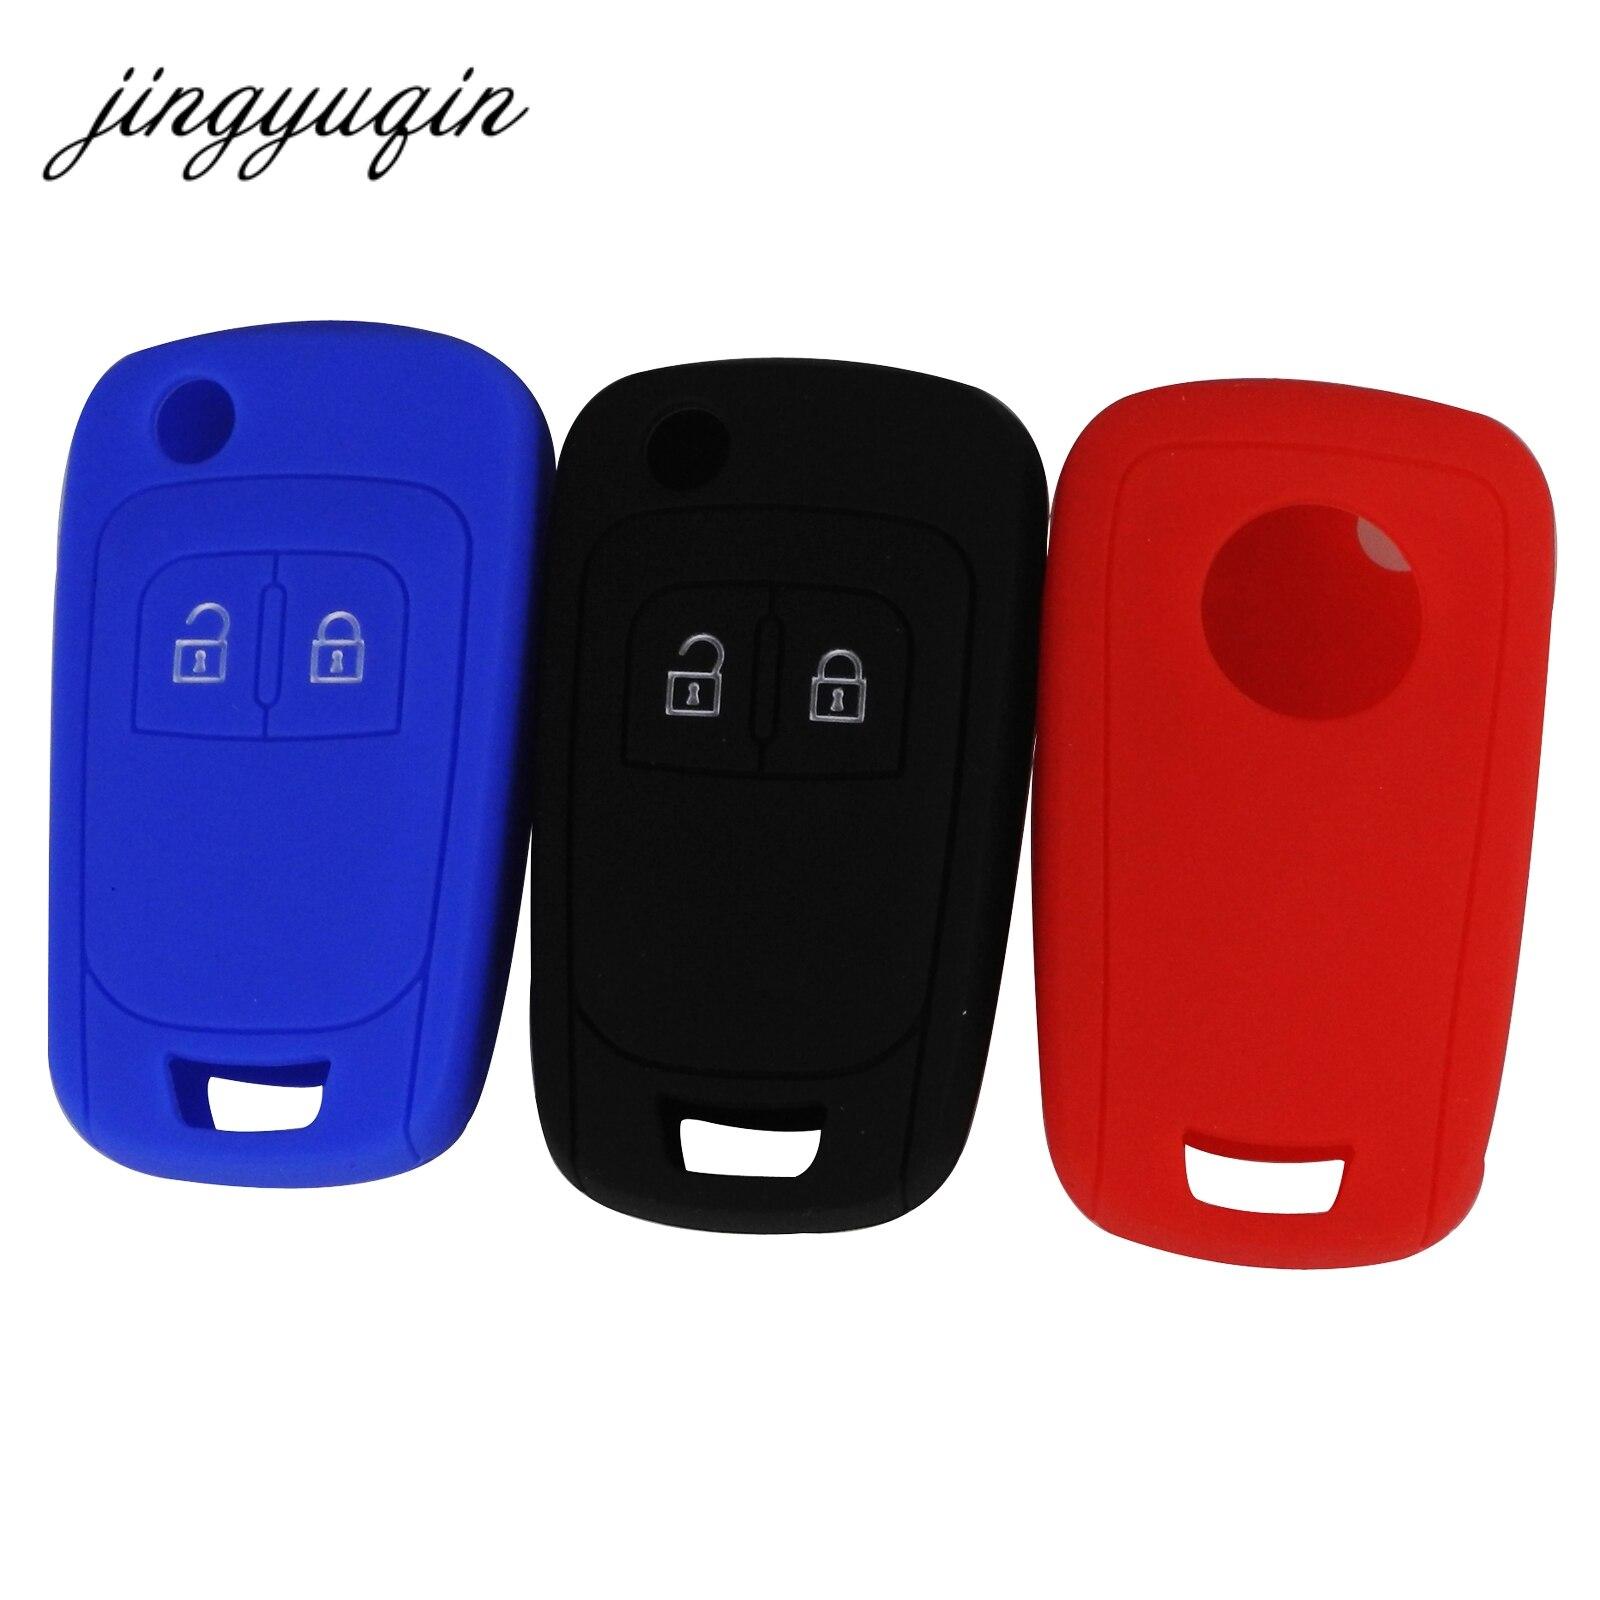 Jingyuqin 30 pçs/lote silicone caso chave do carro para chevrolet lova sail aveo cruze flip dobrável remoto fob capa